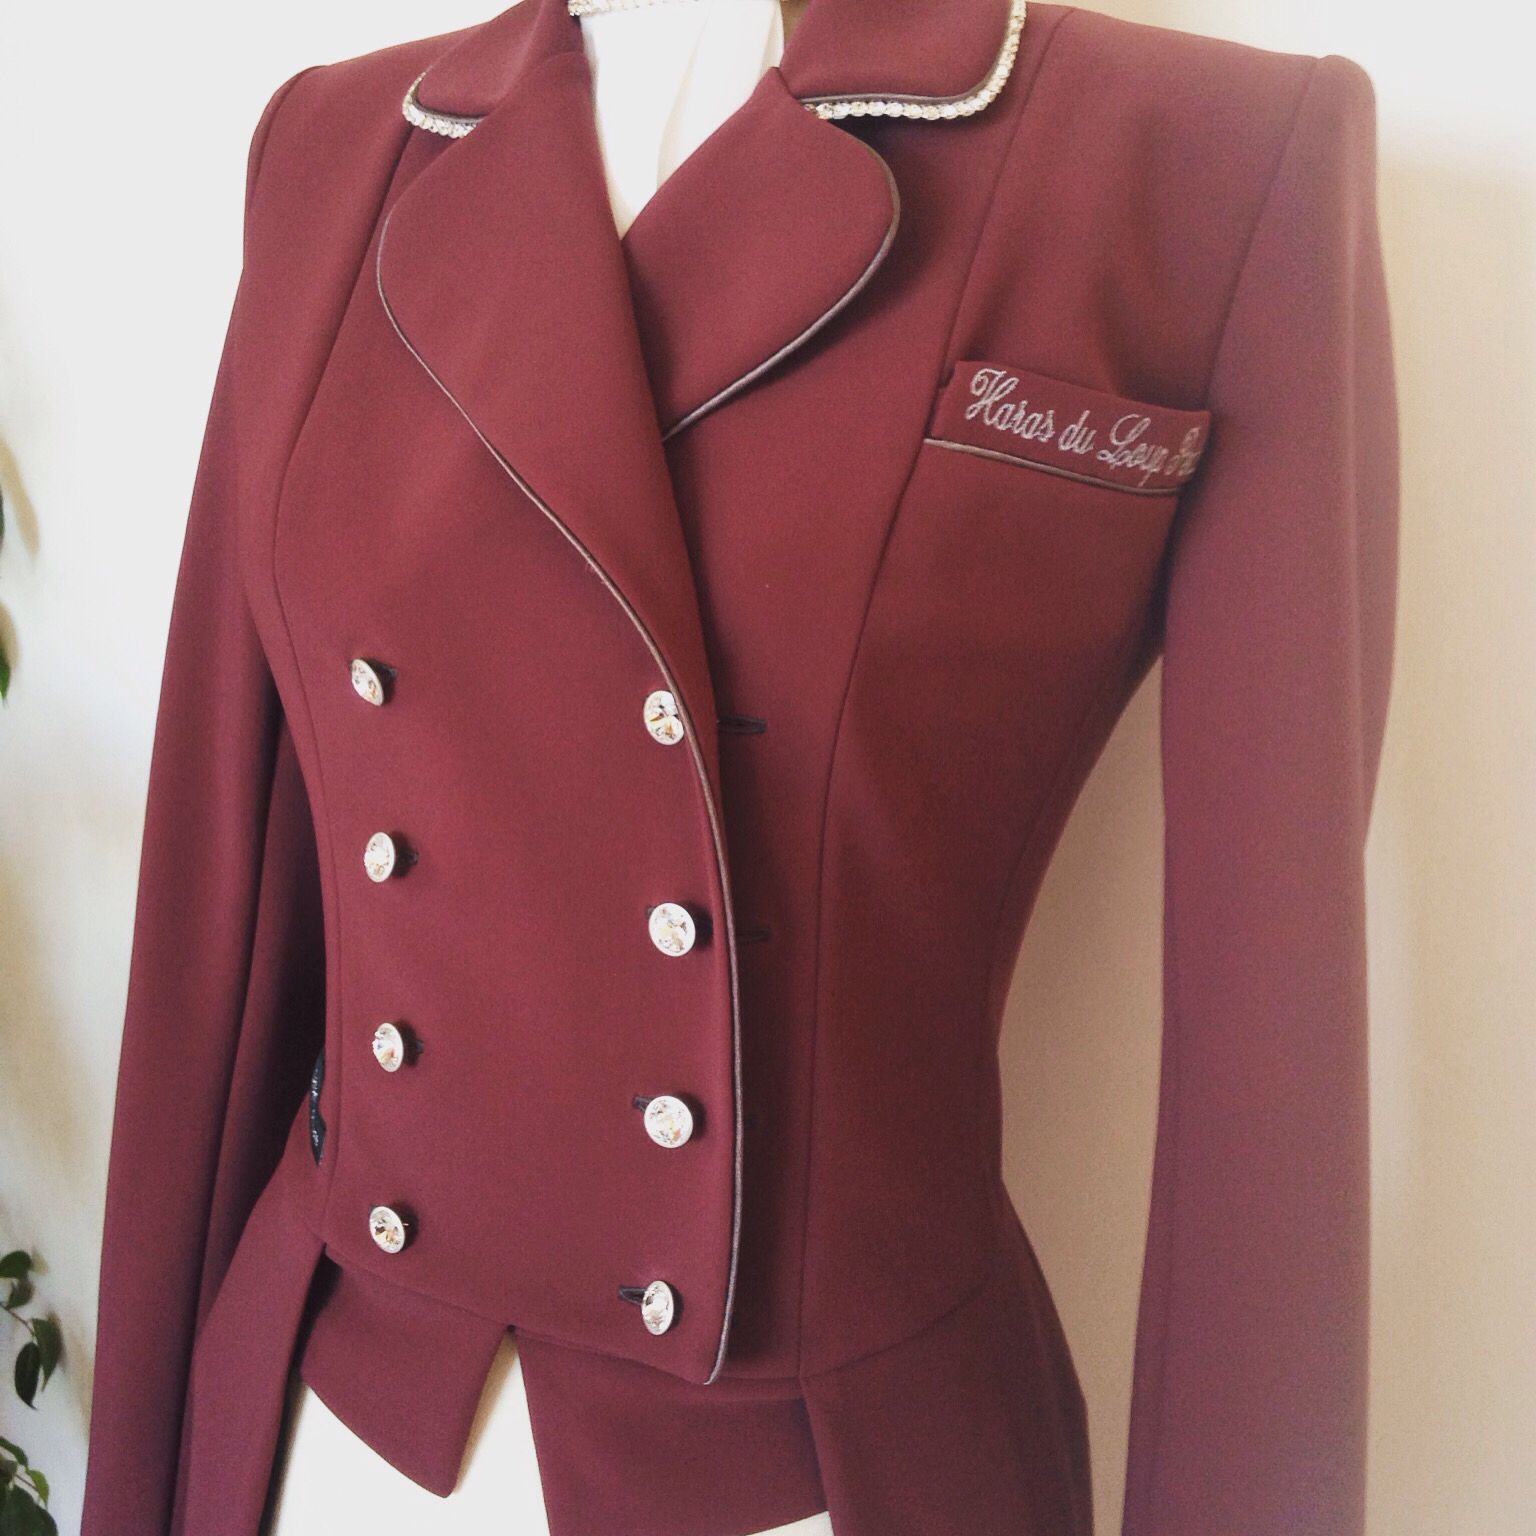 Cavalleria toscana veste concours bordeaux